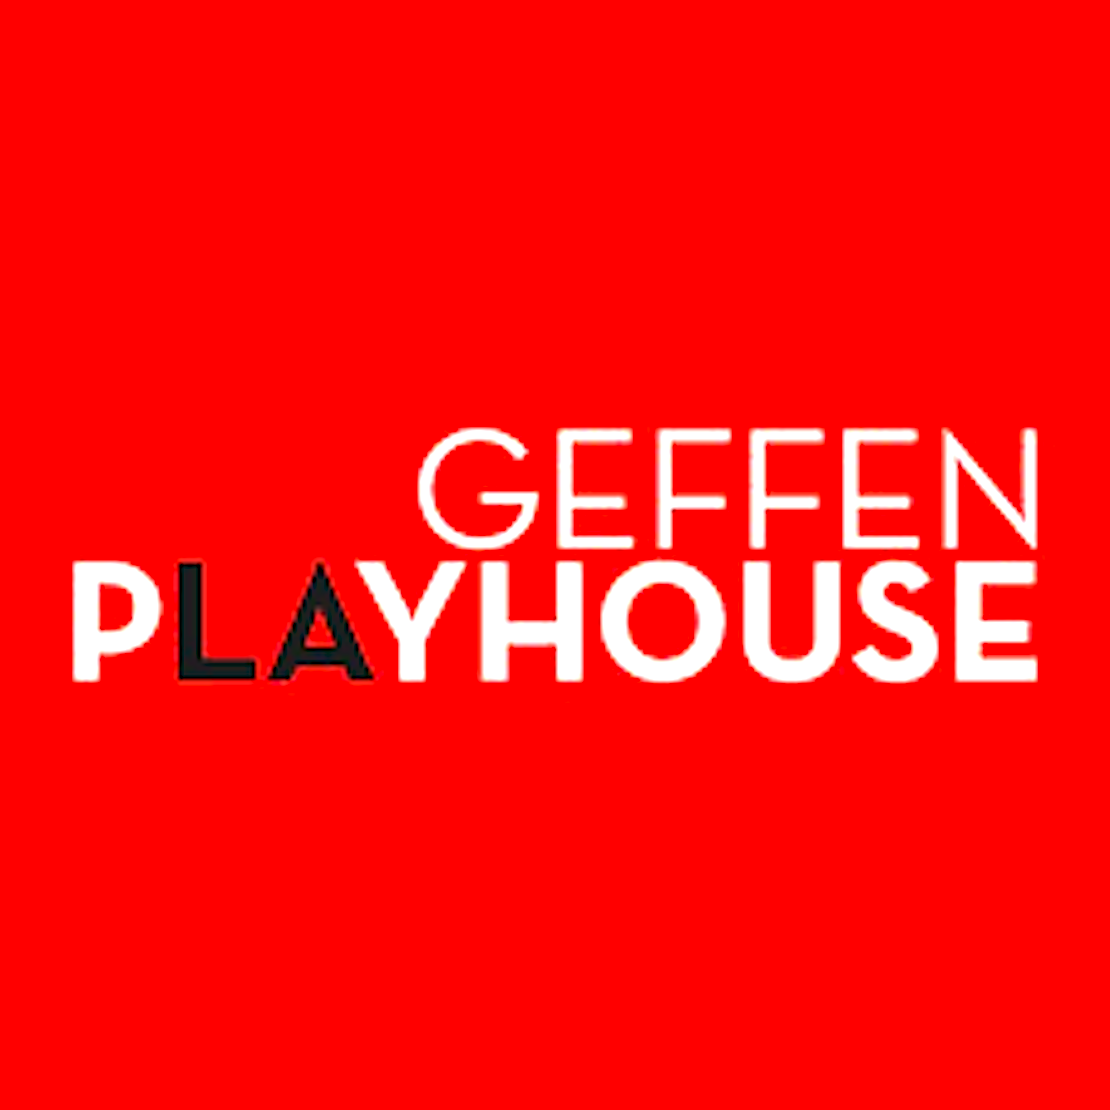 The GEFFEN PLAYHOUSE